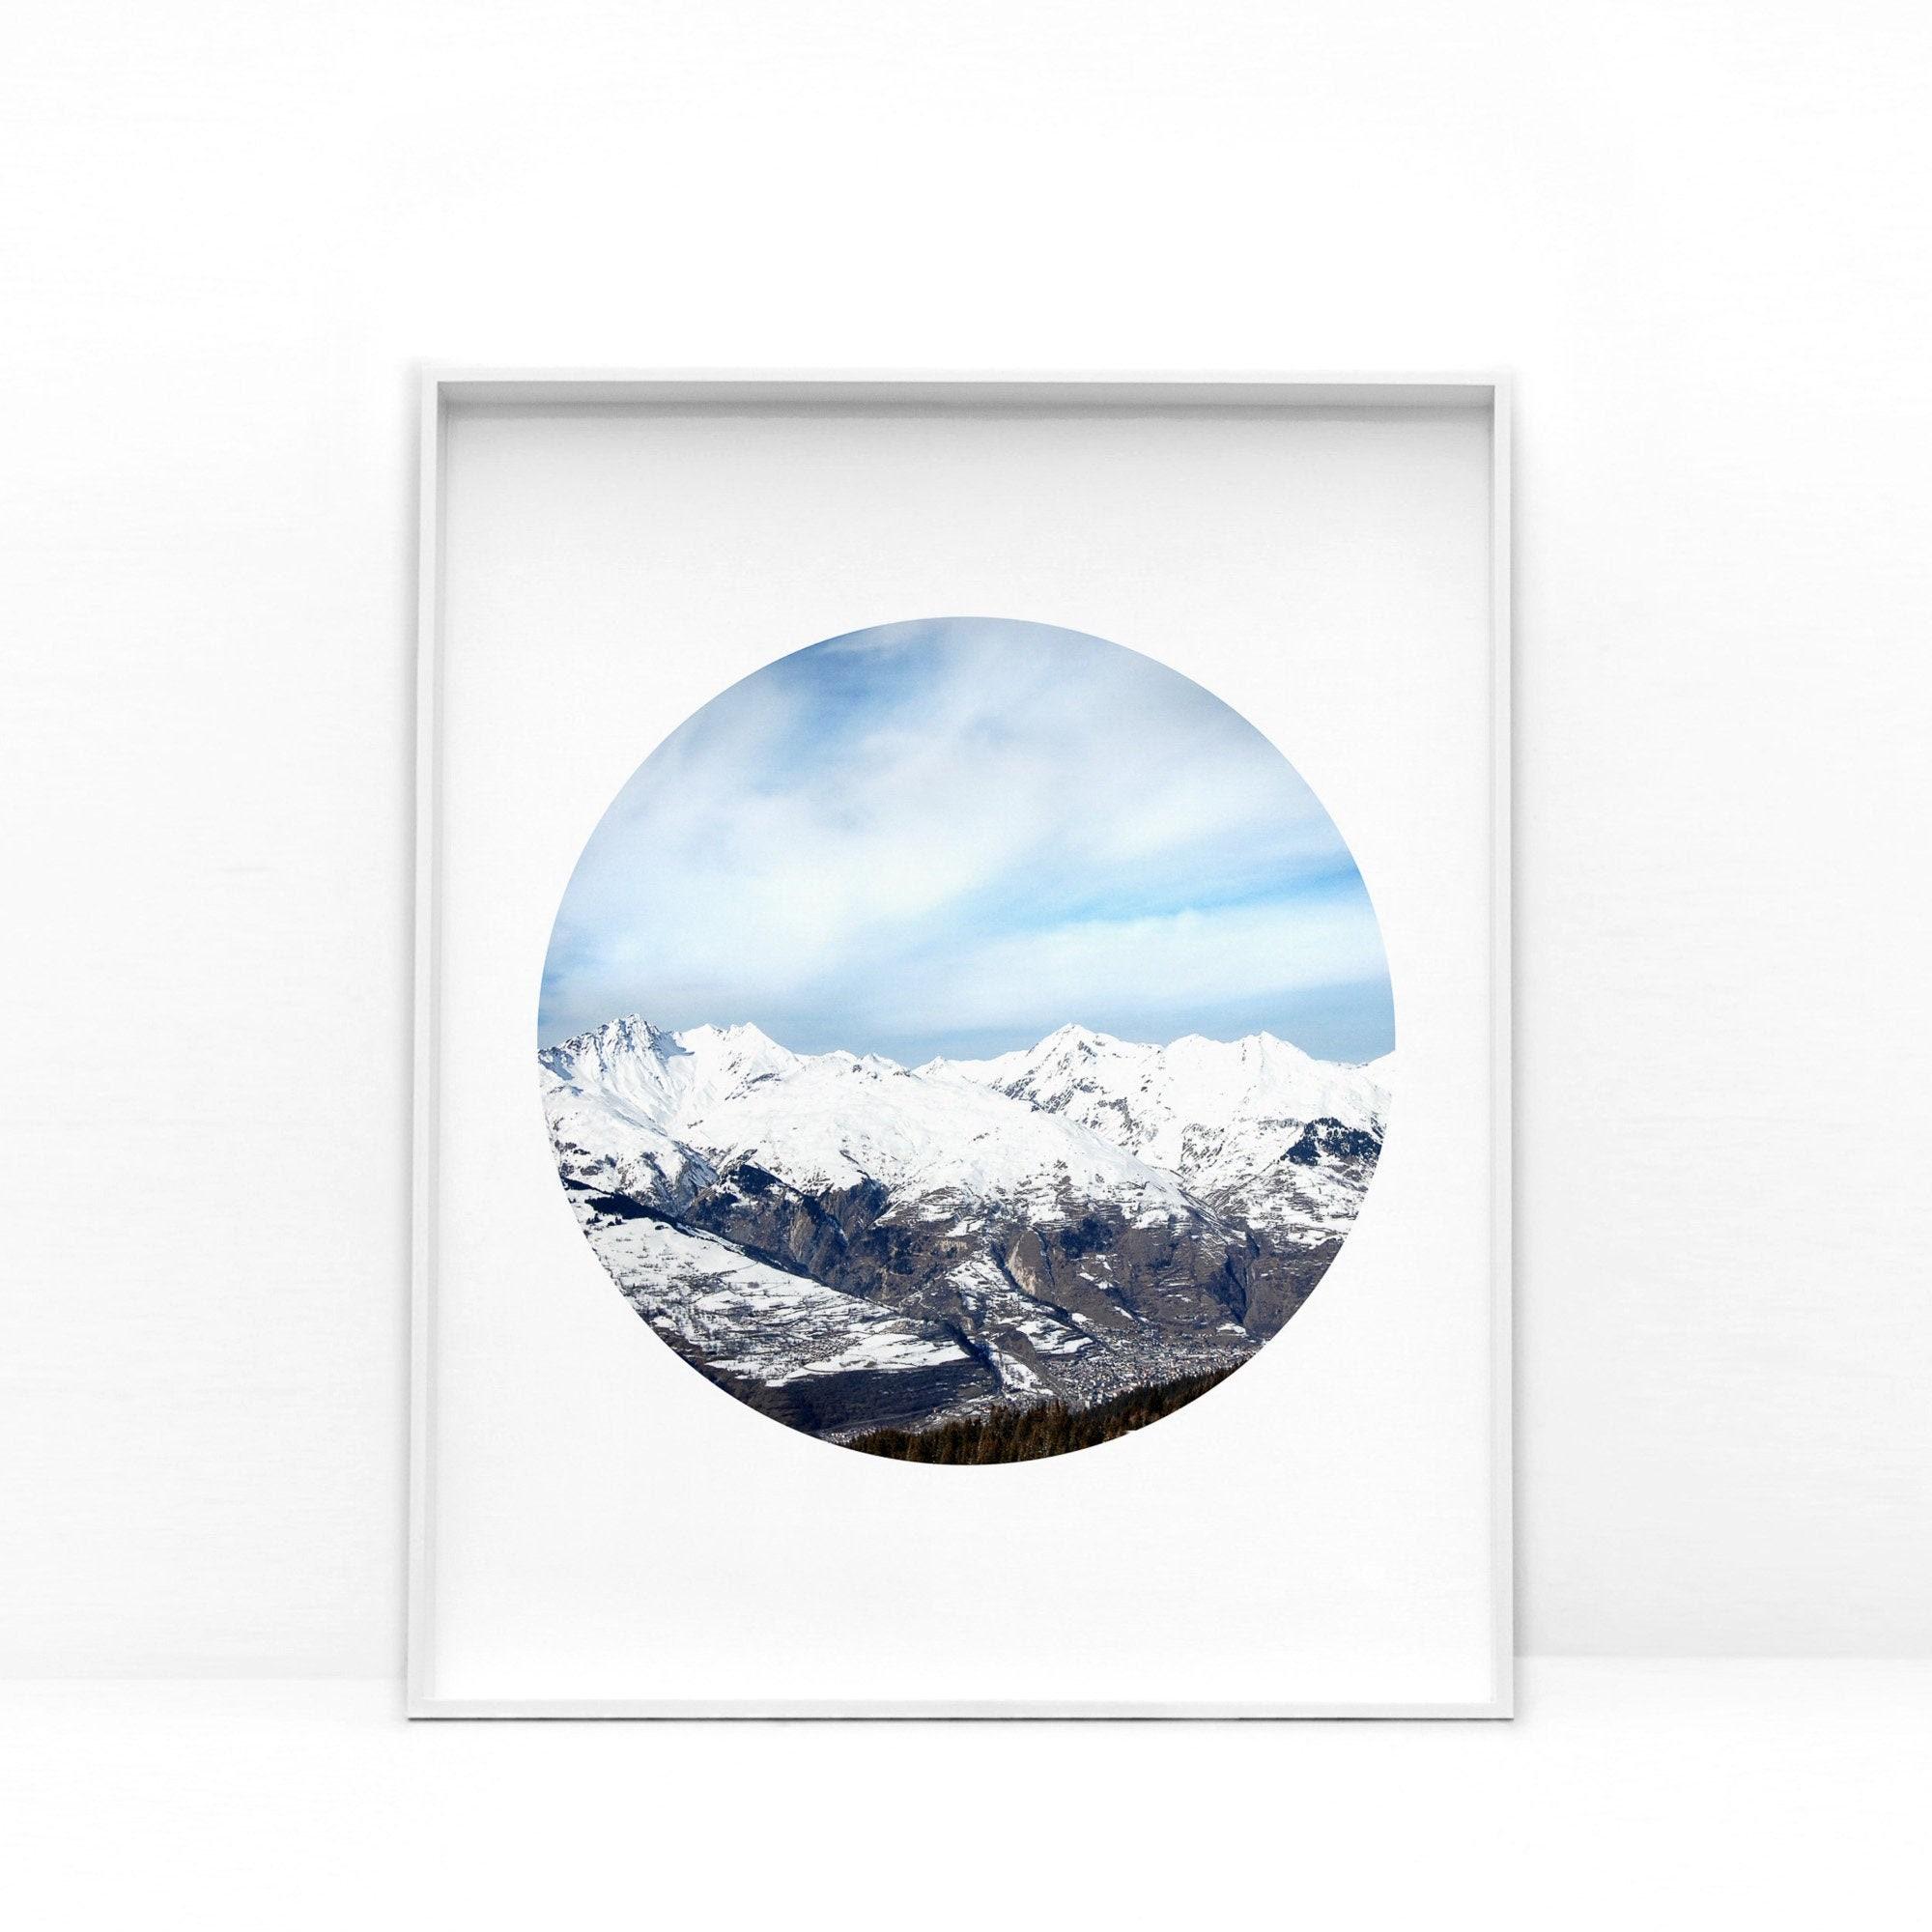 Minimalist Mountain Landscape Art Print, Simple Scandinavian Nature Poster  Print, Blue And White Mountain Wall Art Living Room Wall Decor